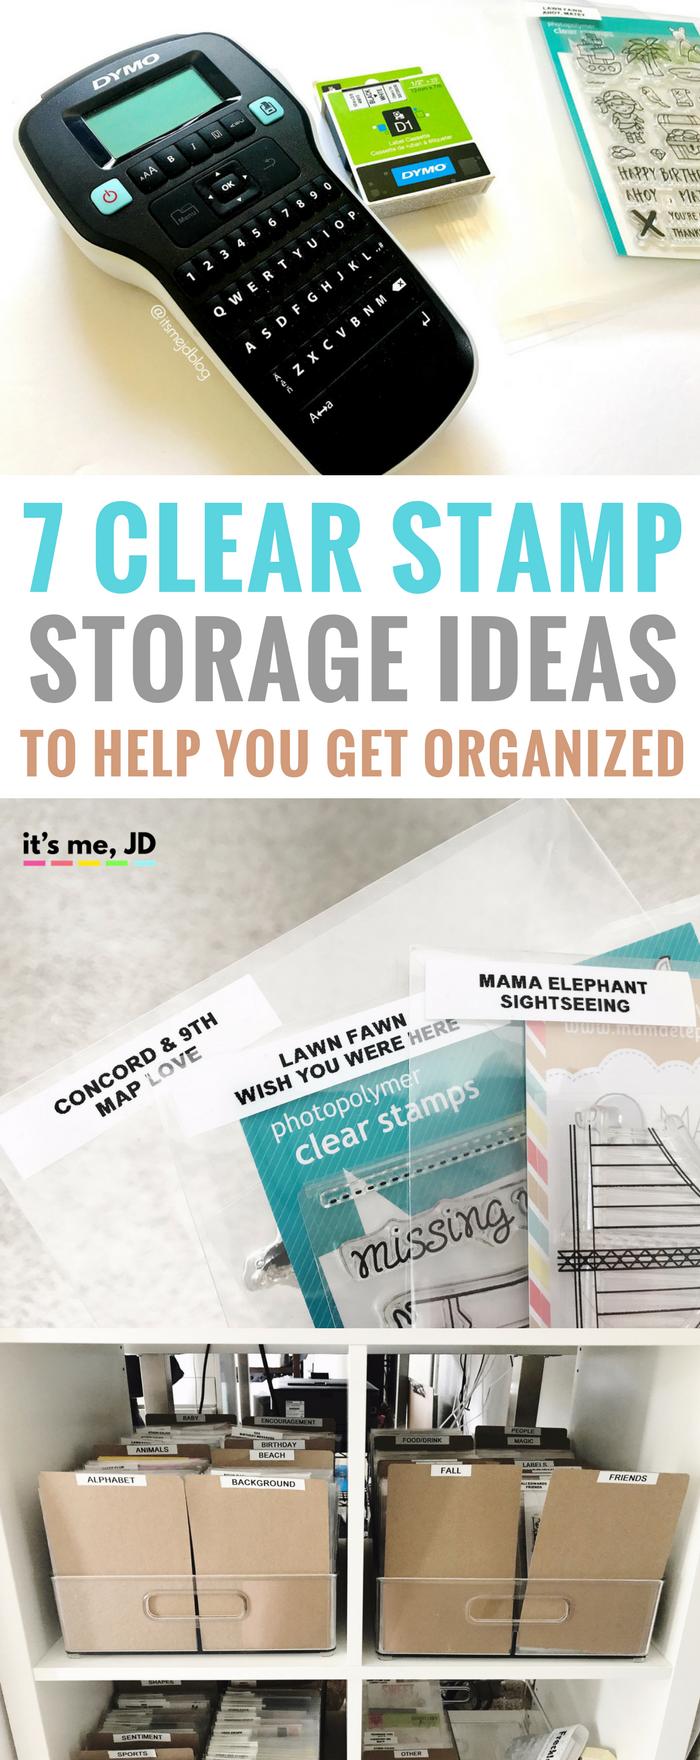 #papercrafts #stamping #cardmaking #scrapbook Clear Stamp Storage Ideas To Help You Organize, binder, pockets, DIY